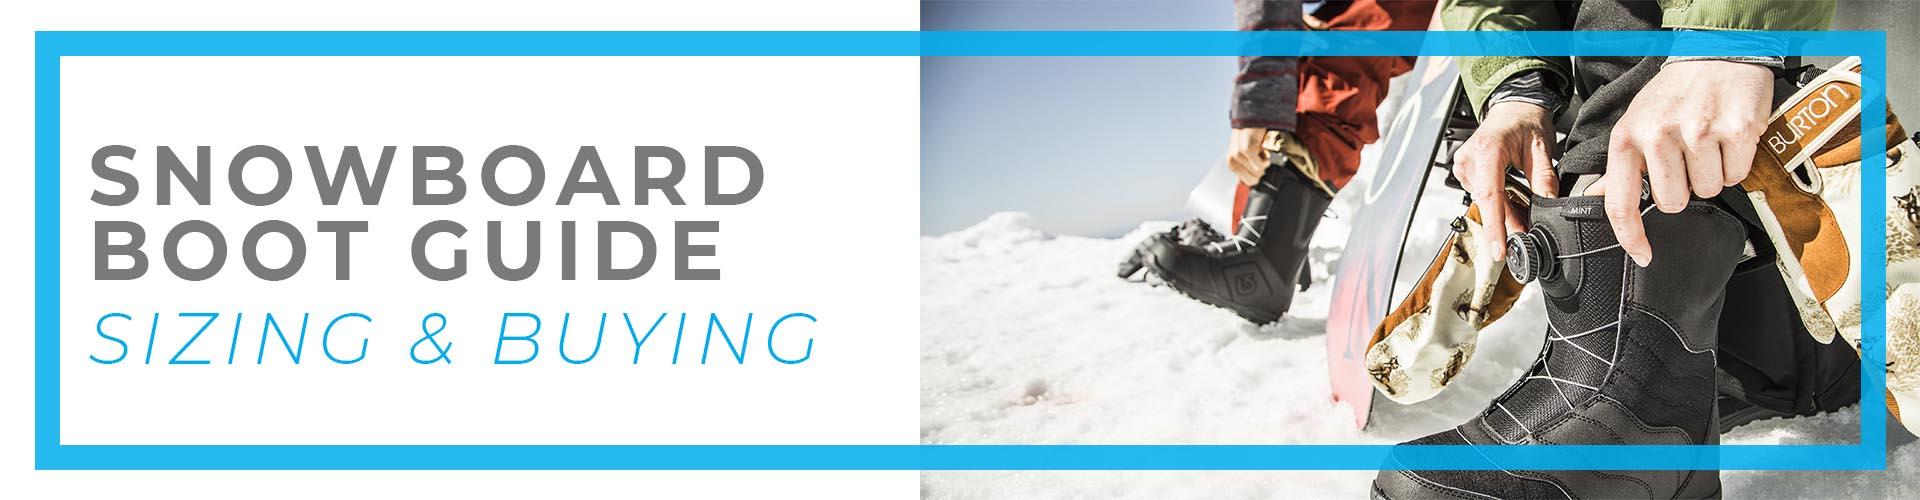 snowboardboot-buyingguide-banner-1920x500.jpg